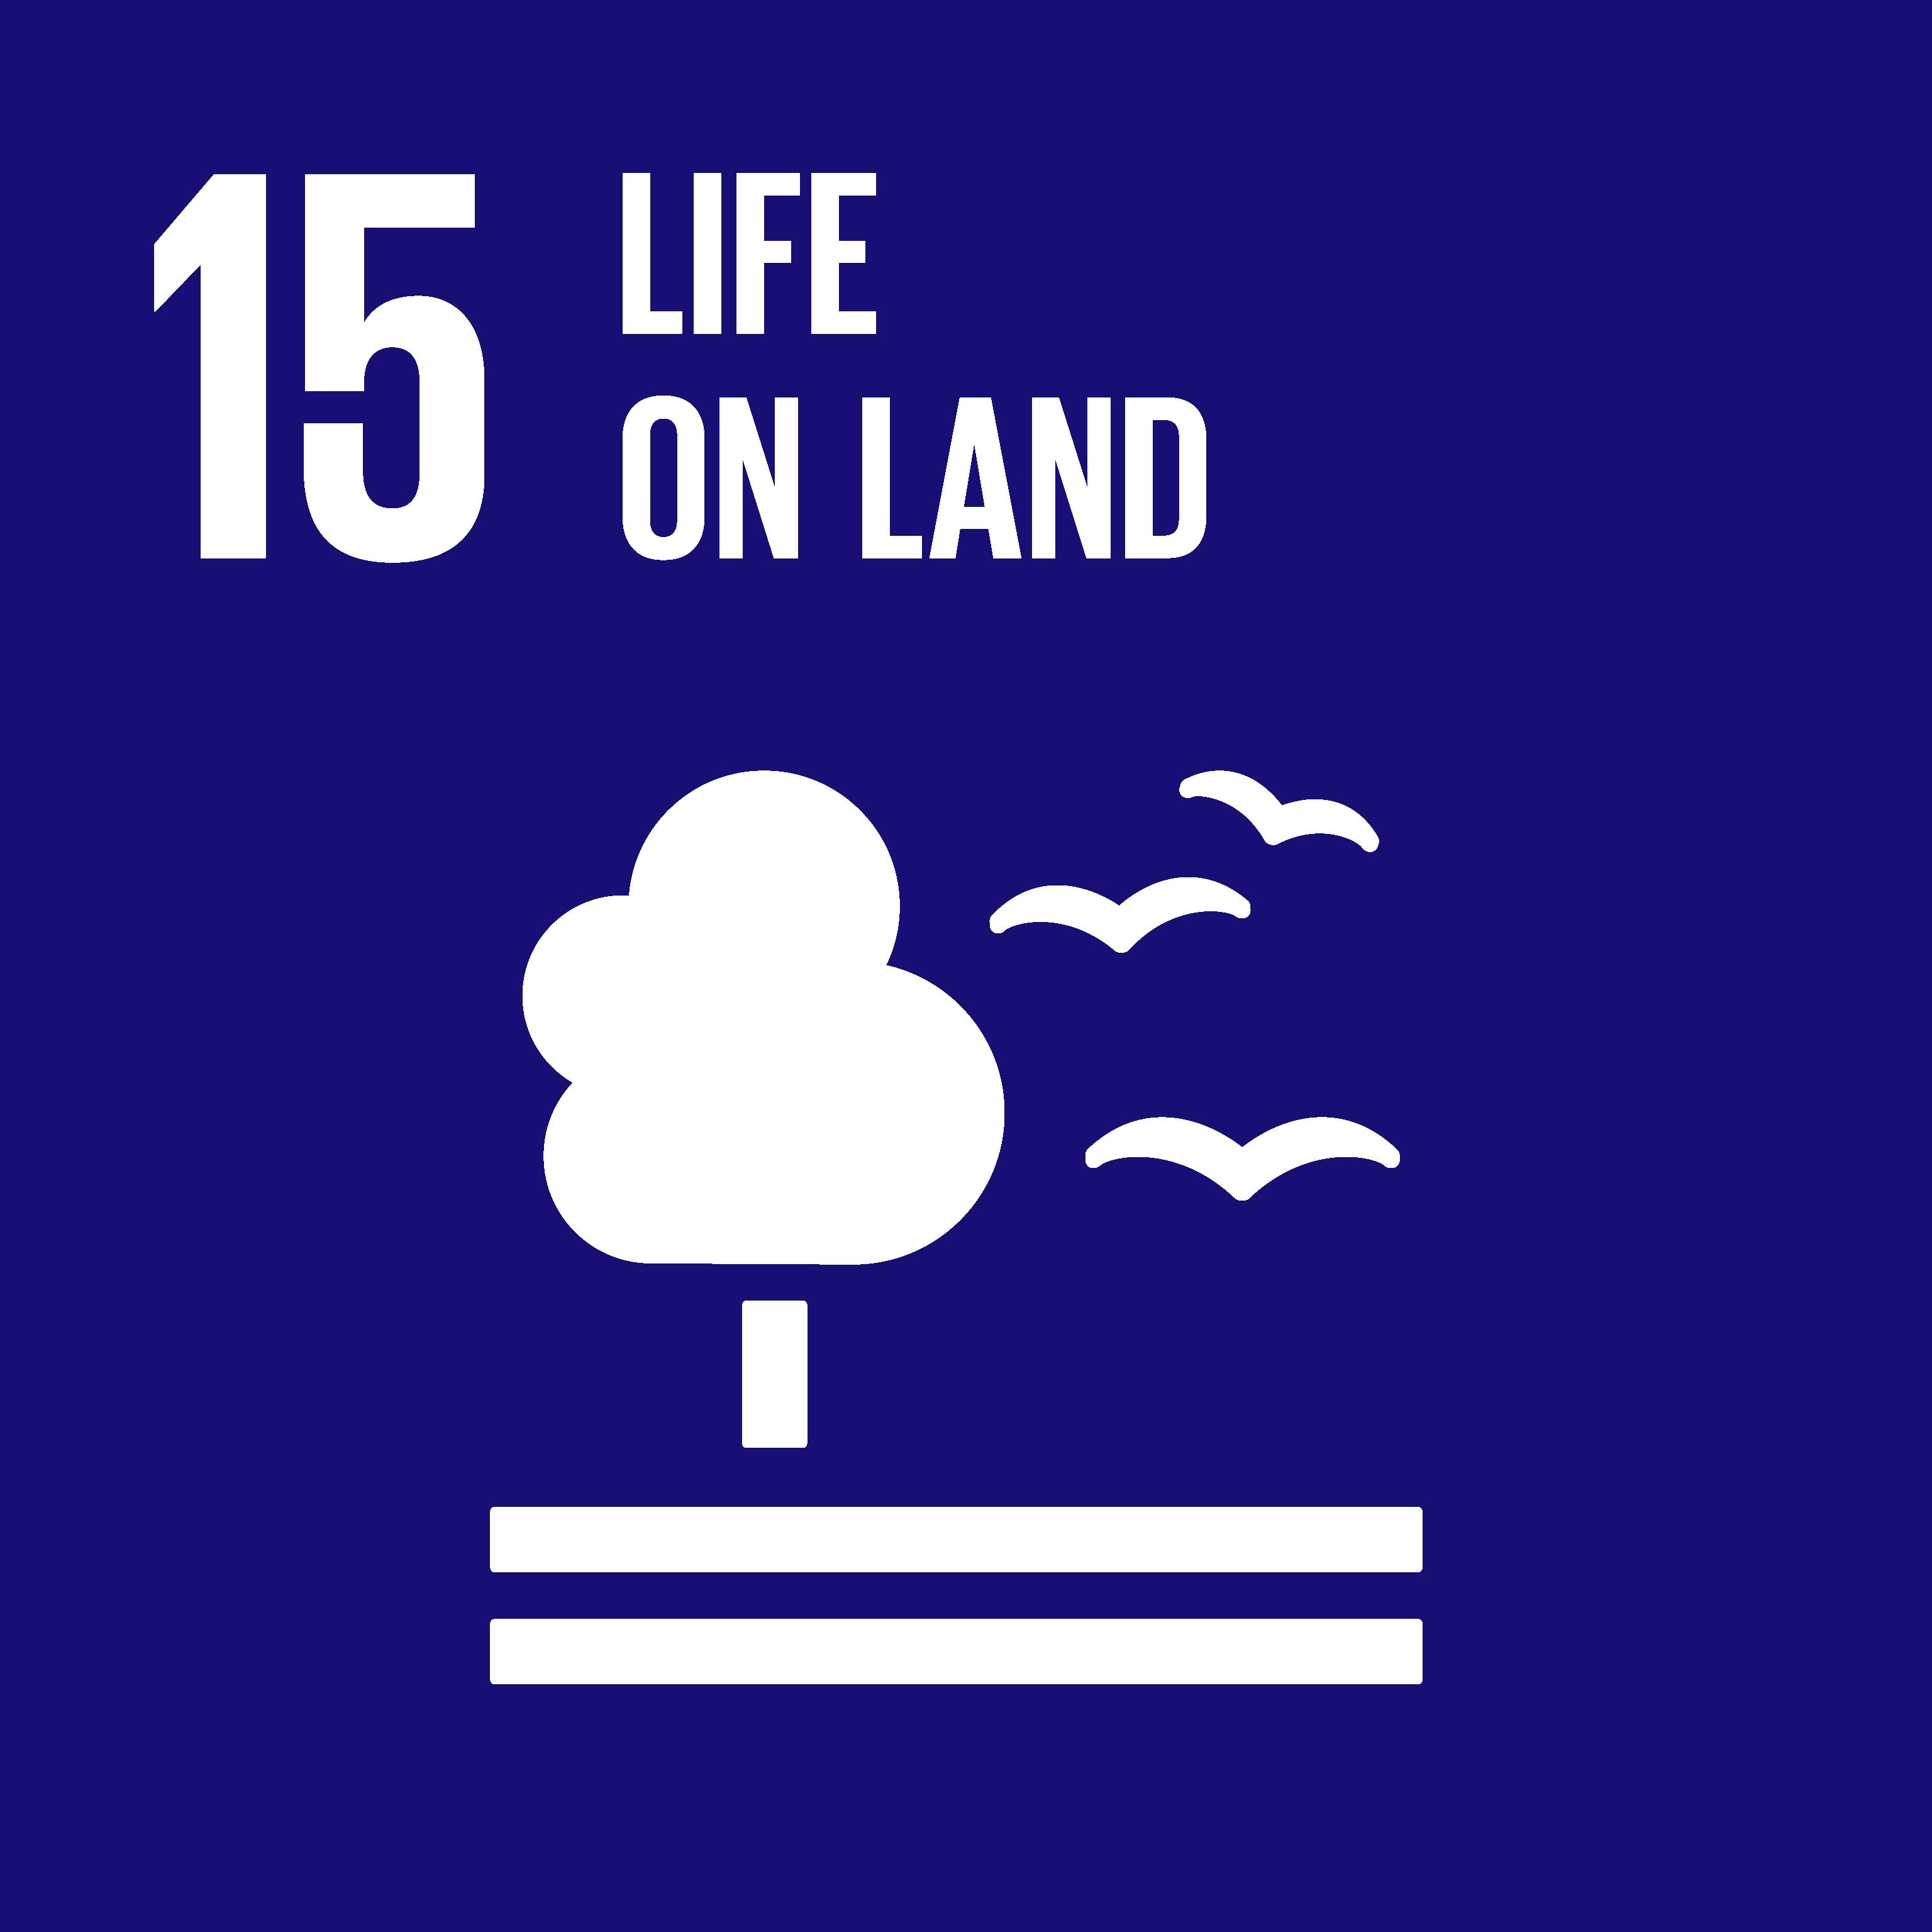 United Nations Goal 15: Life On Land